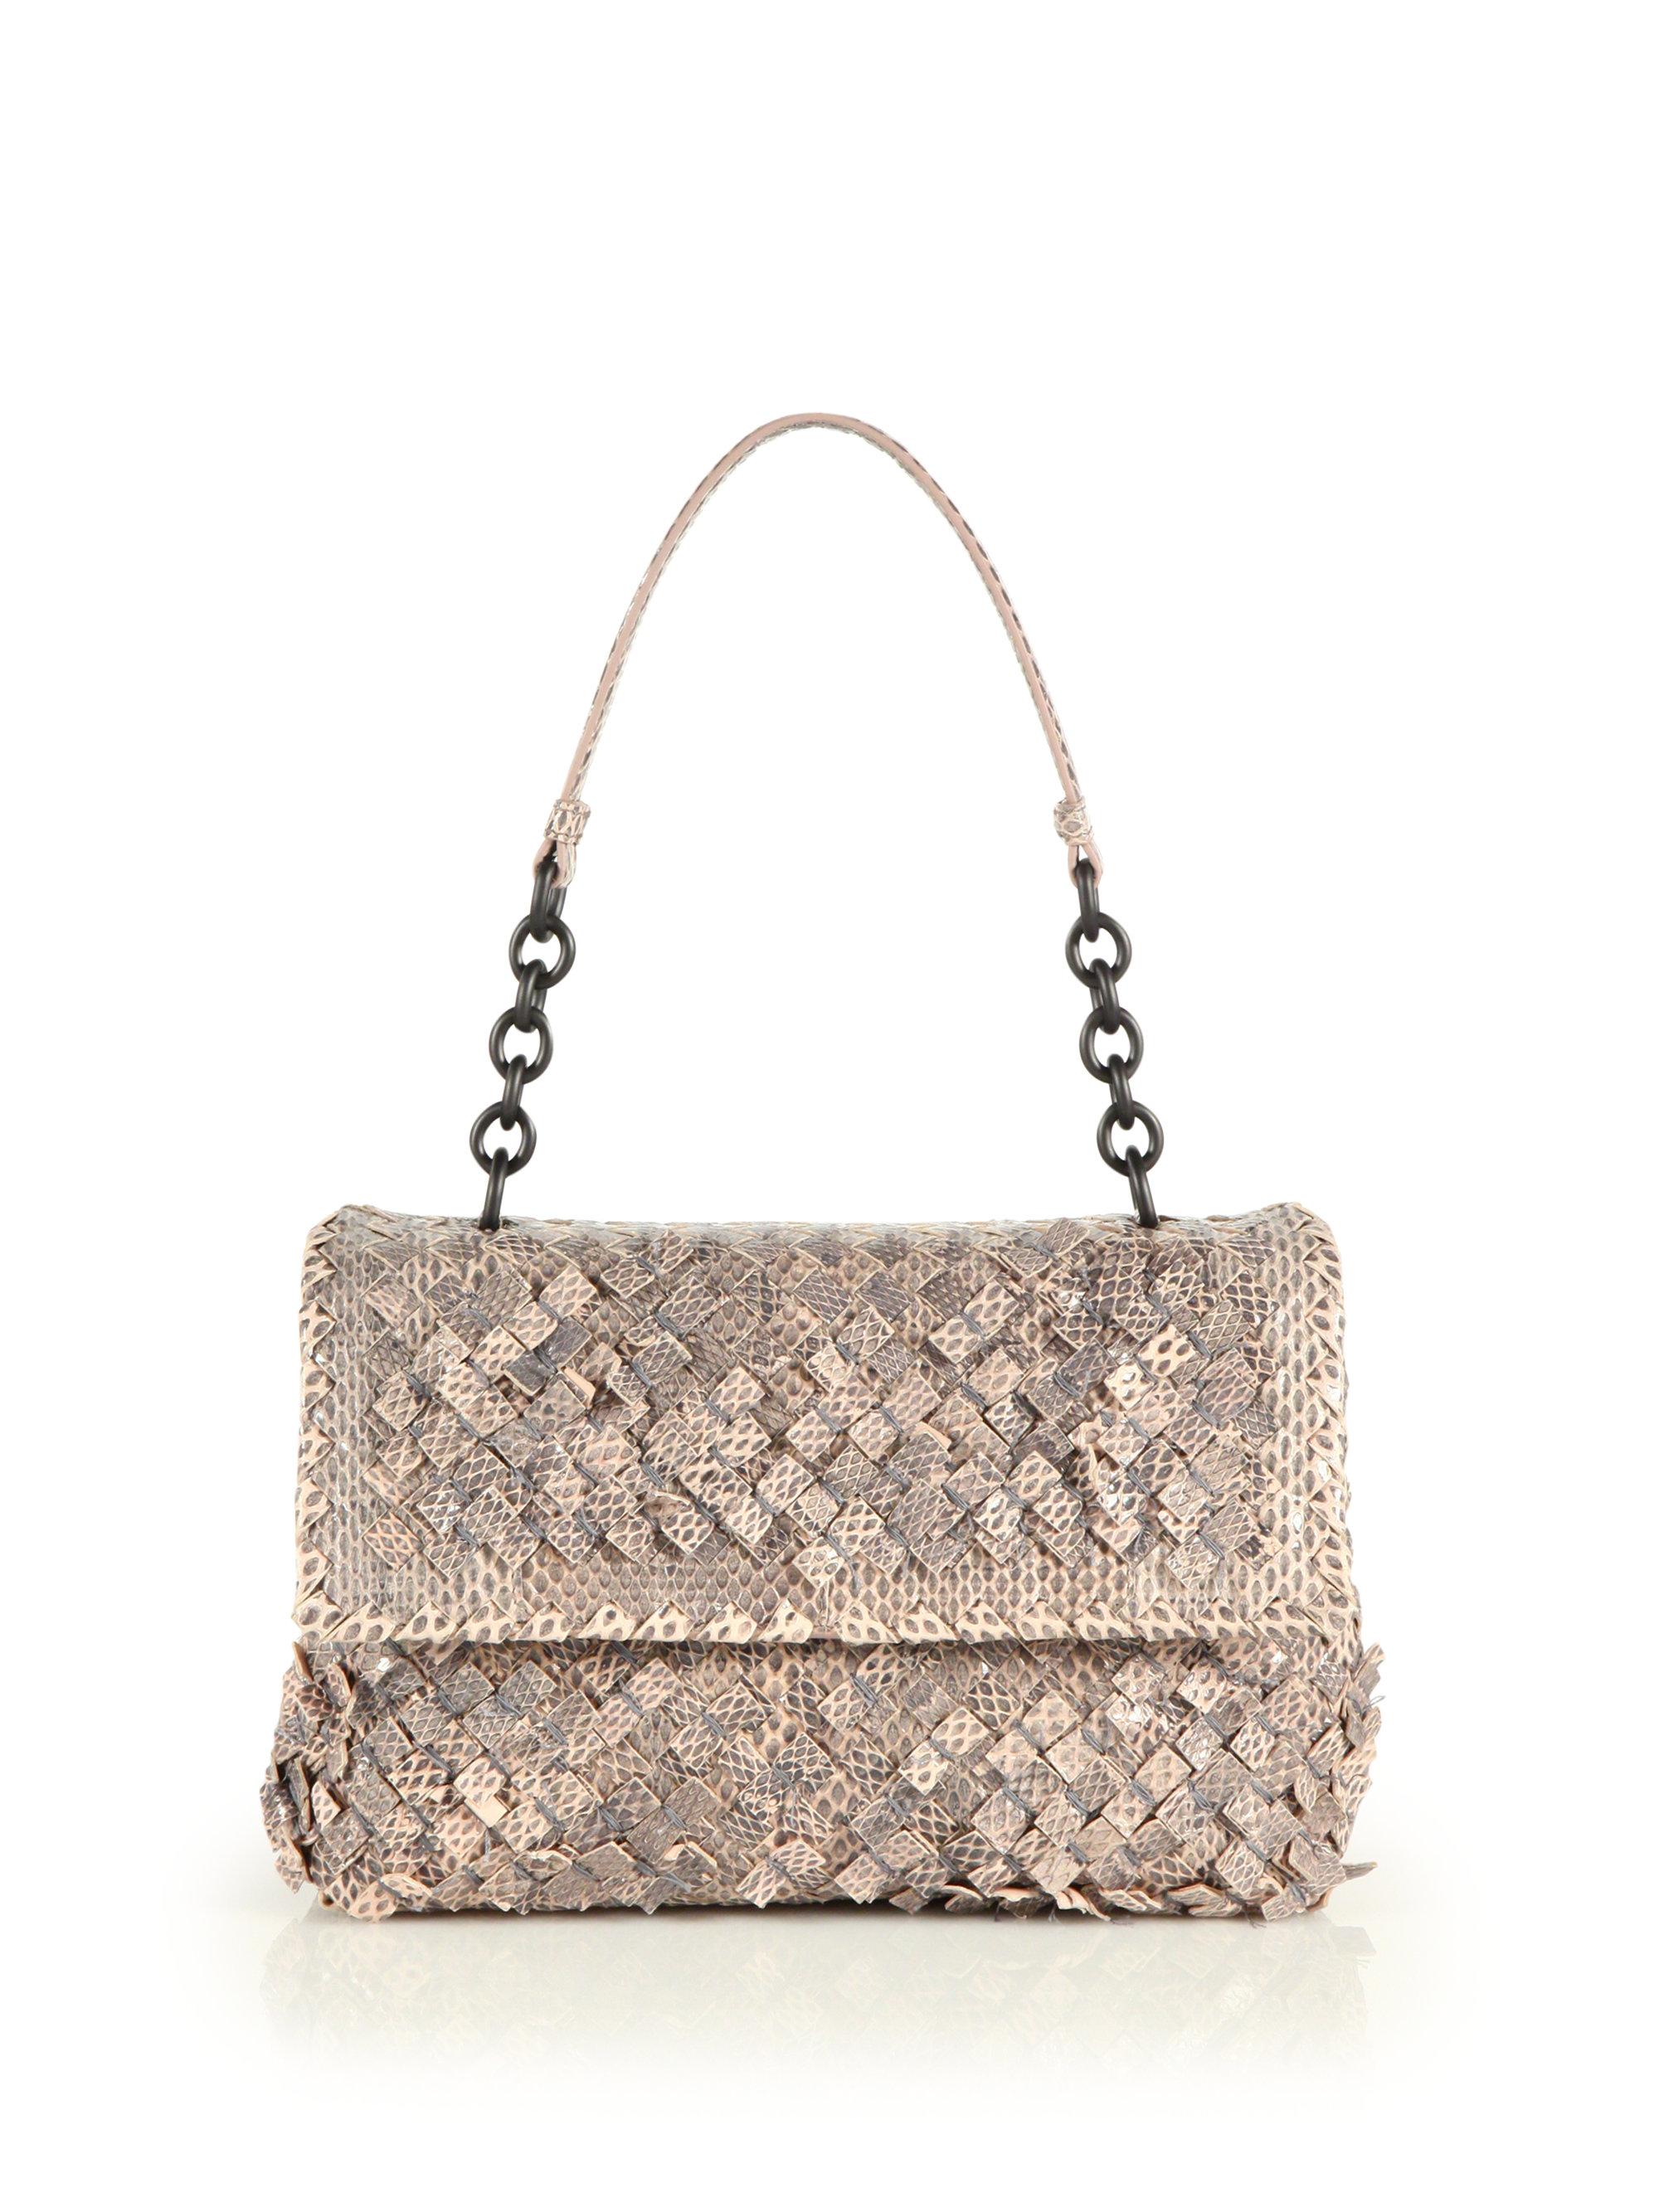 prada discount bags - Bottega veneta Olimpia Intrecciato Snakeskin Top-handle Bag in ...